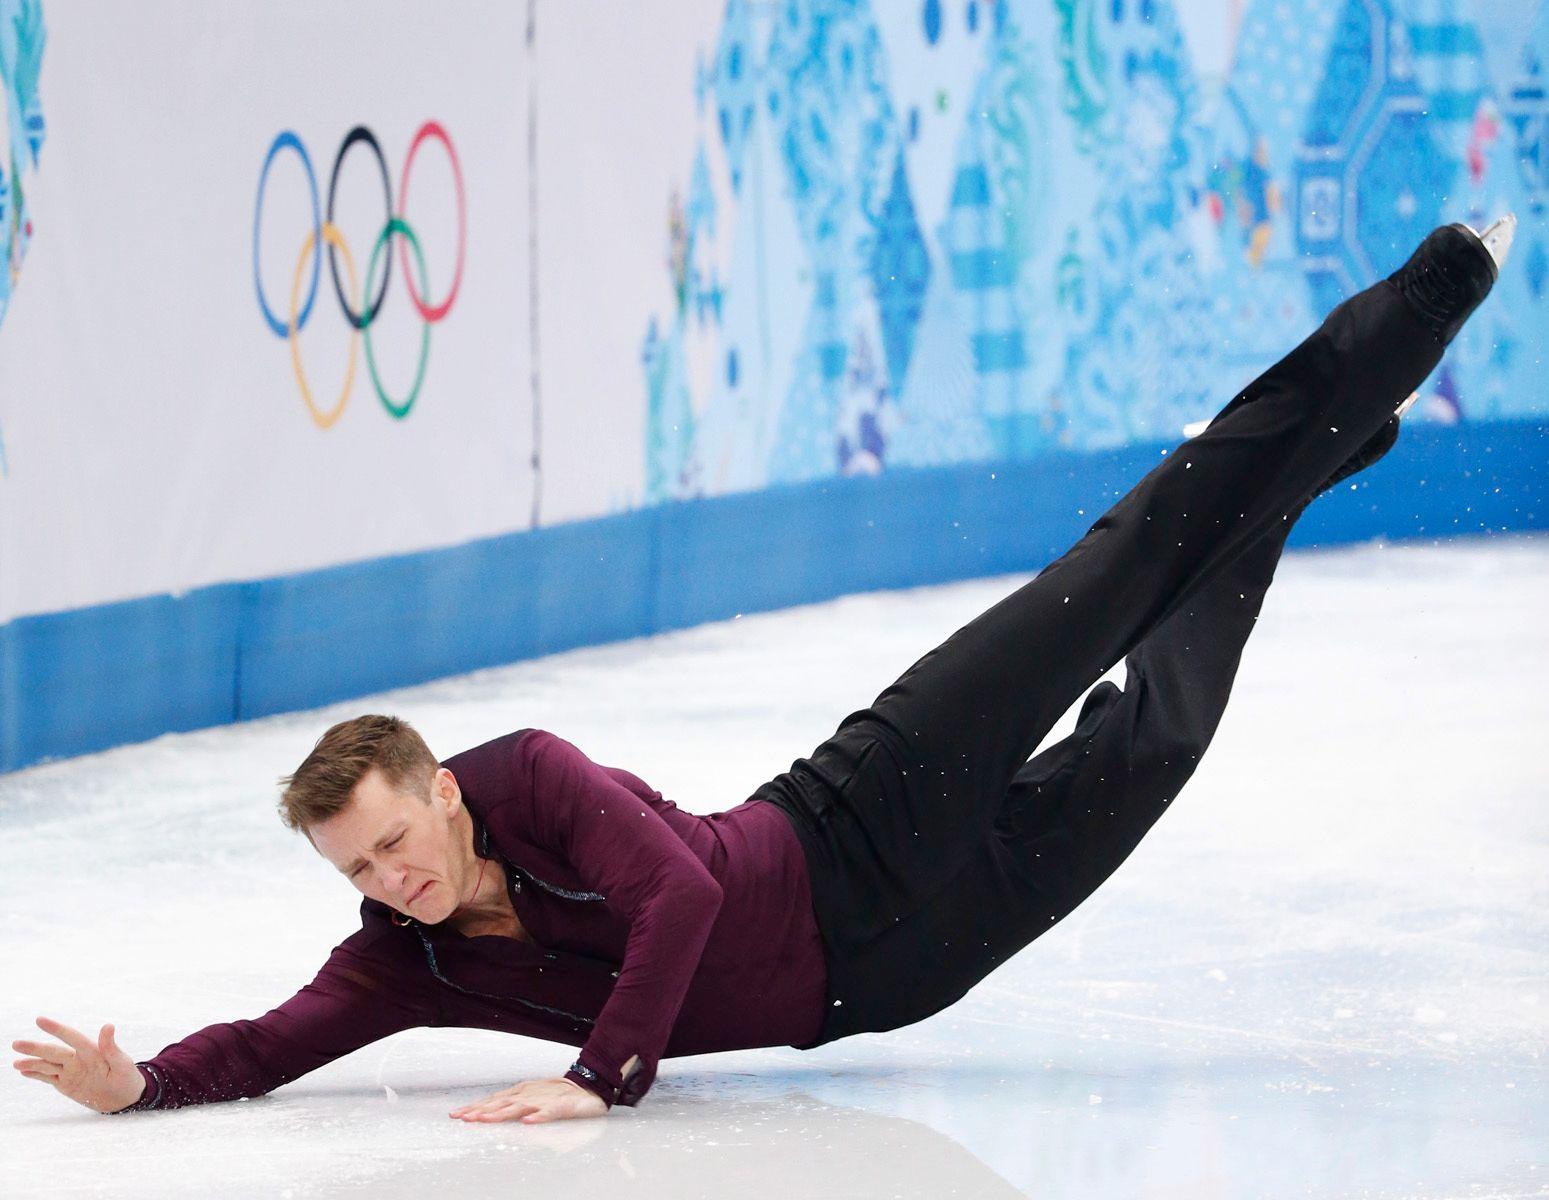 FEBRUARY 13, 2014  SOCHI, RUSSIA